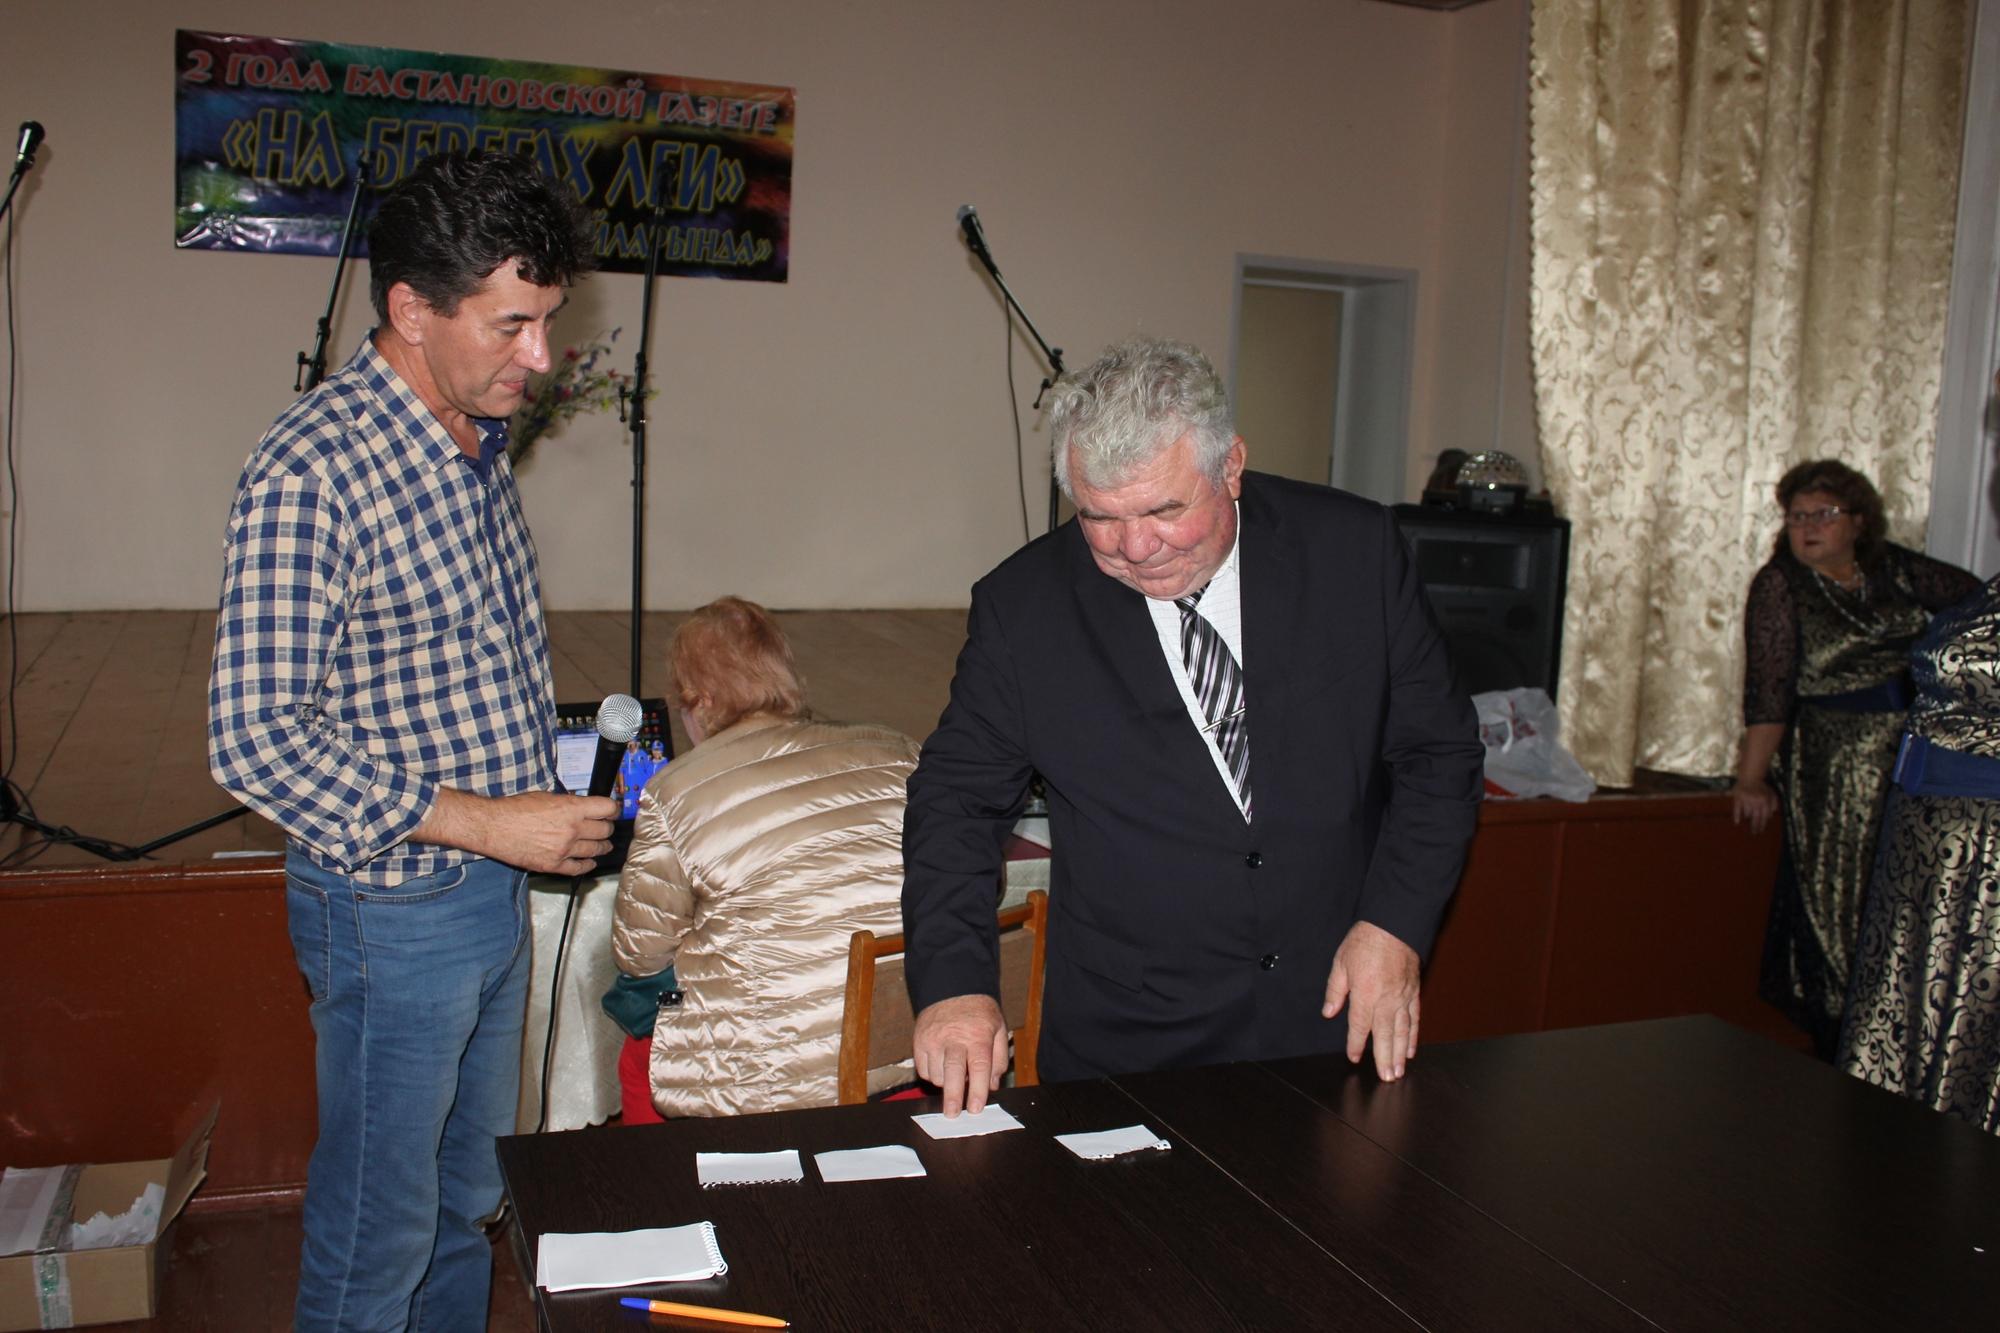 4119-bastanovo-17082019-gazete-na-beregax-leyi-2-goda